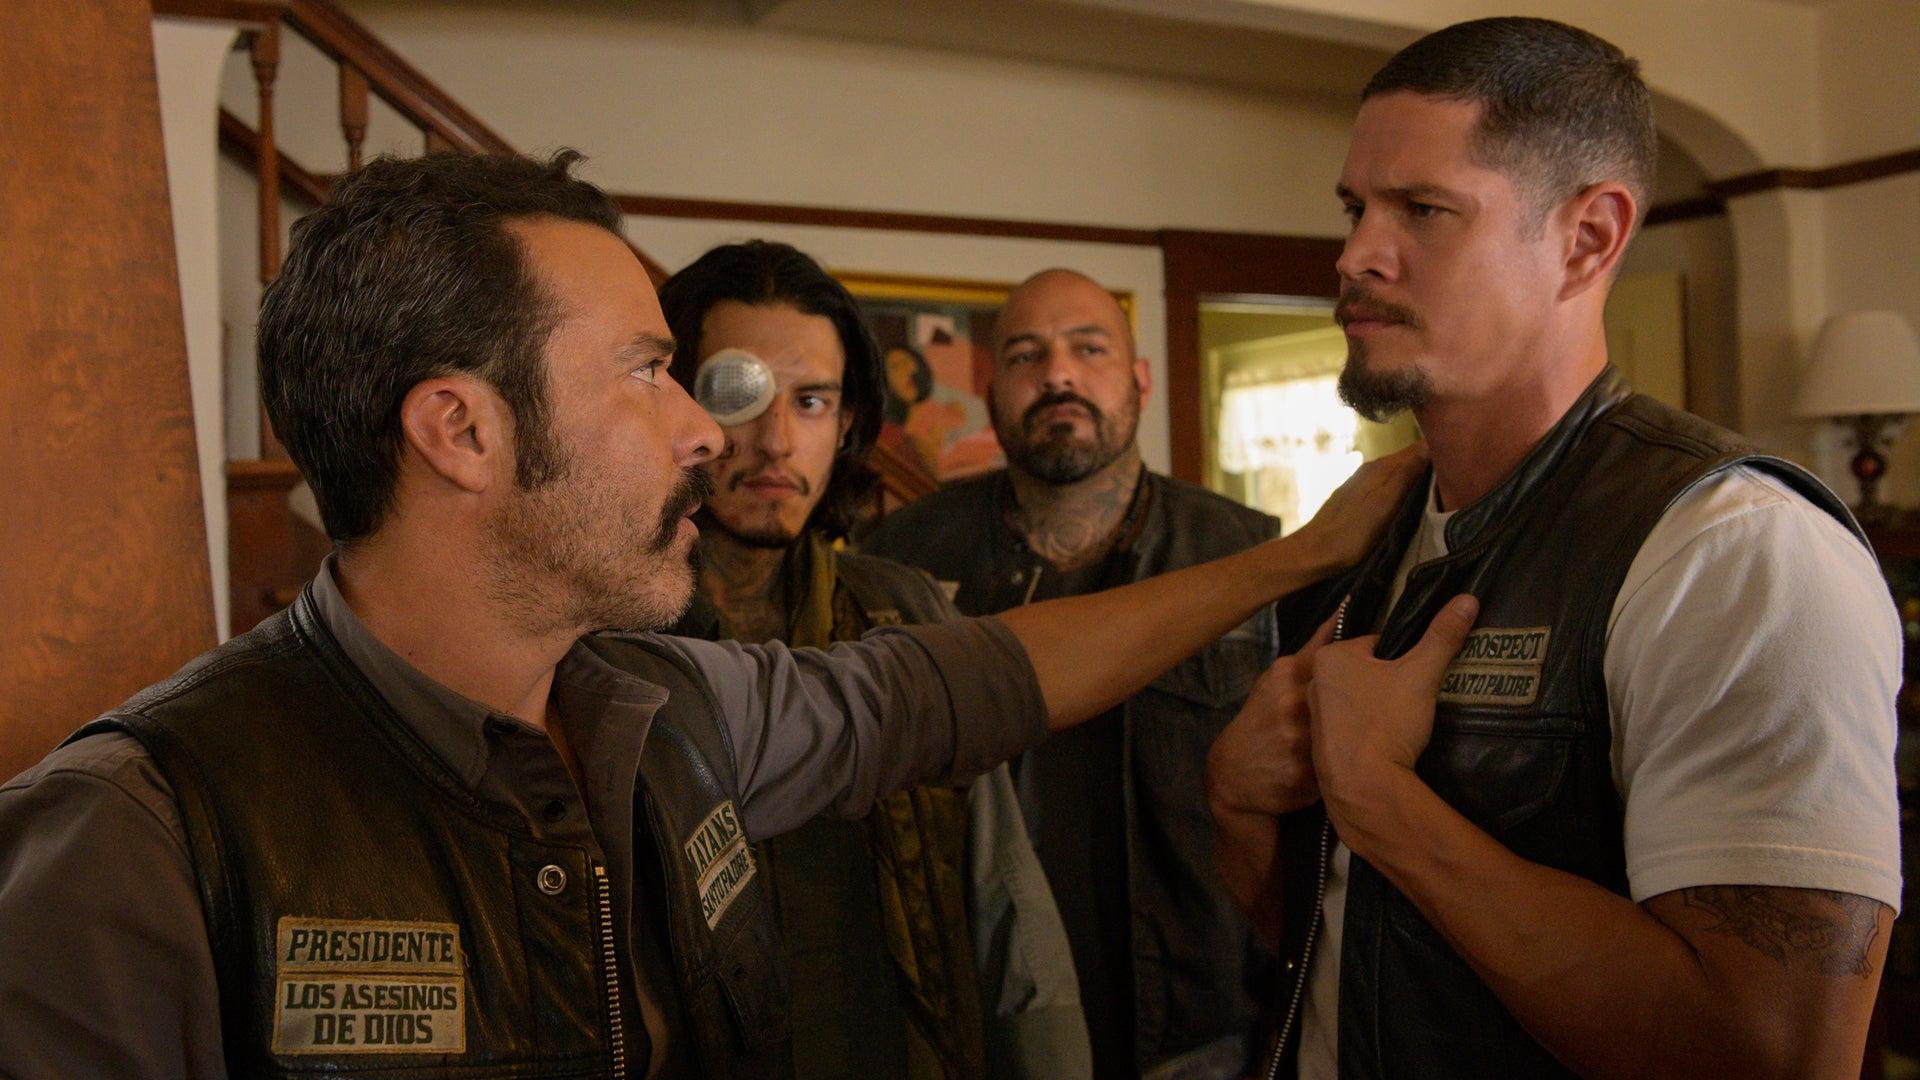 Michael Irby, Richard Cabral, Vincent Rocco Vargas, and JD Pardo, Mayans MC